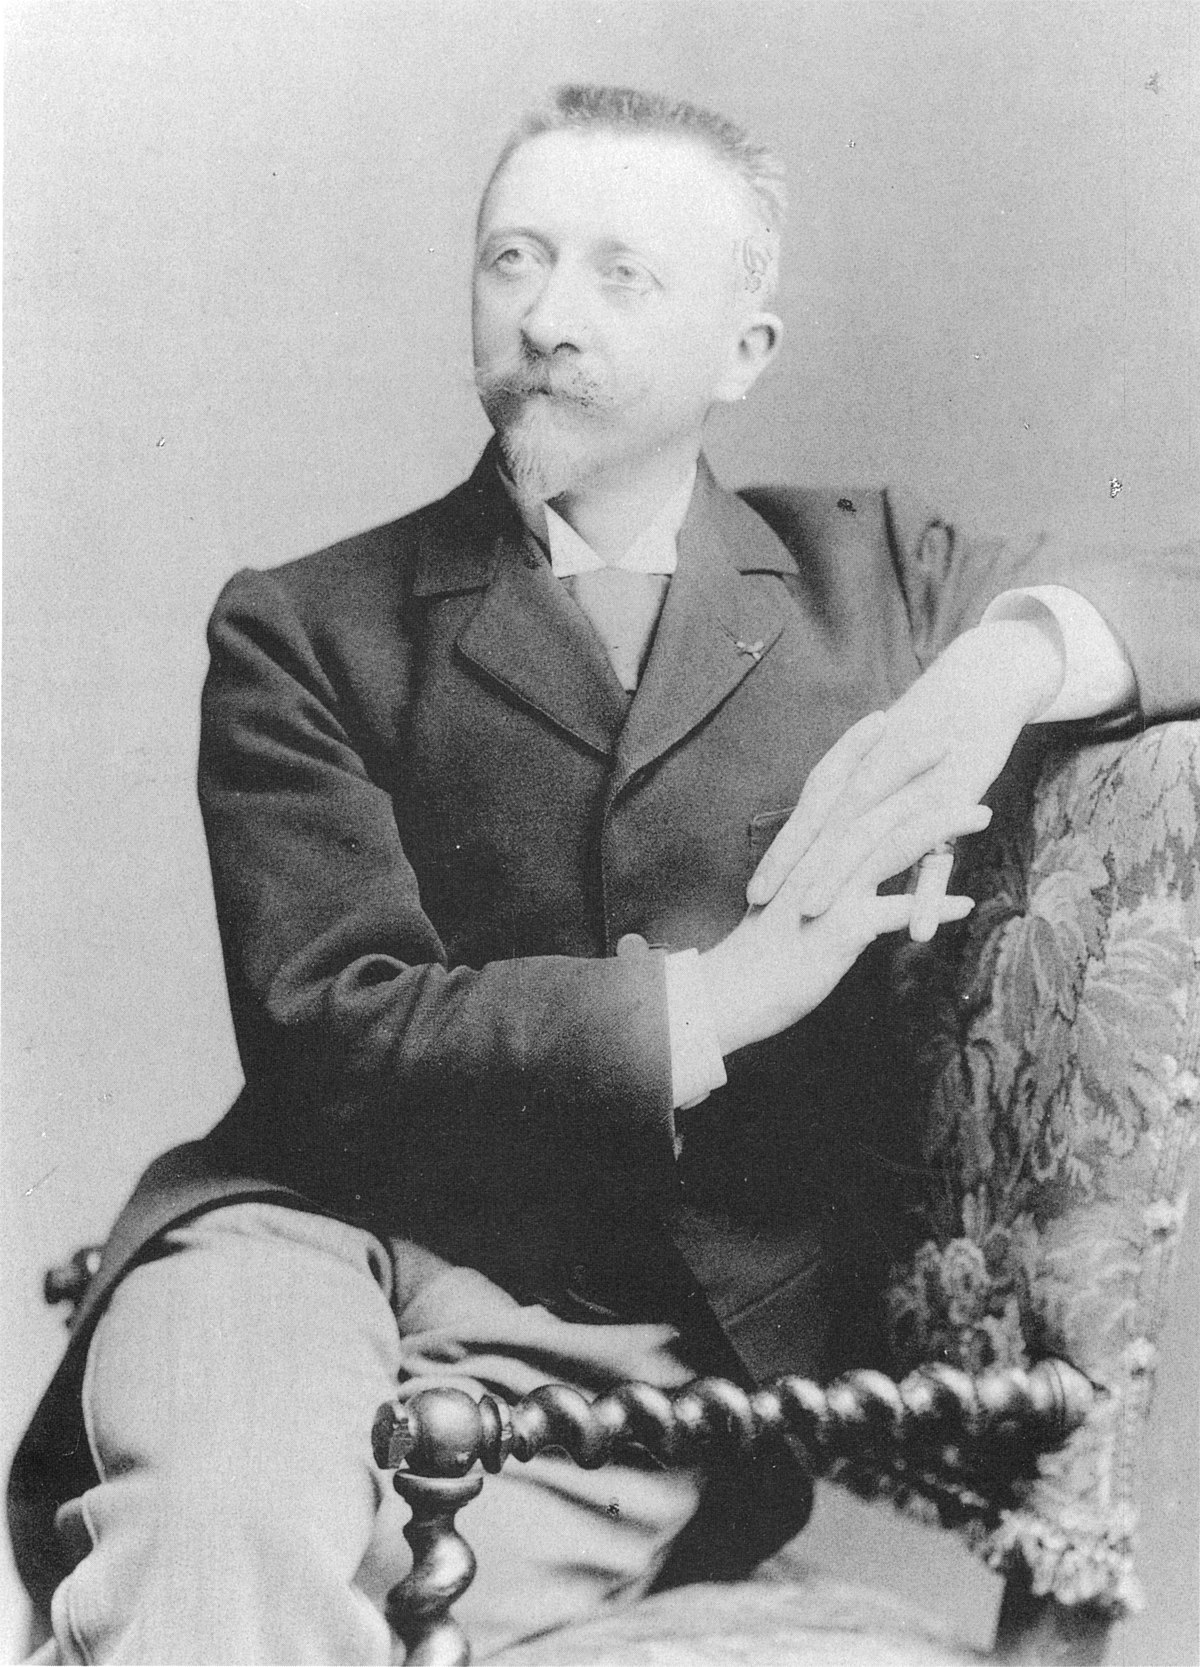 201 Douard Niermans Architect Wikipedia